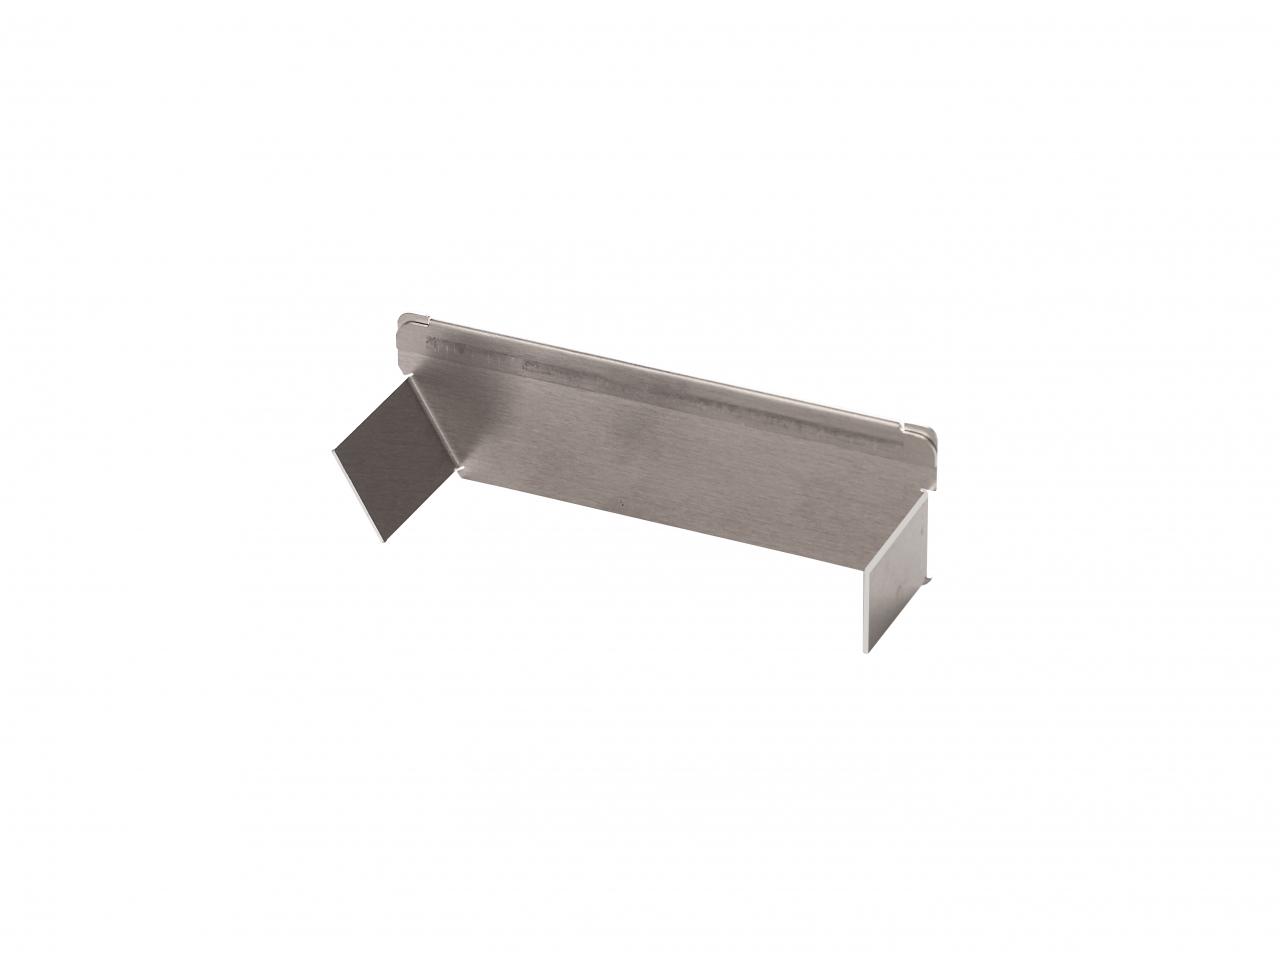 Enddeckel Aluminum